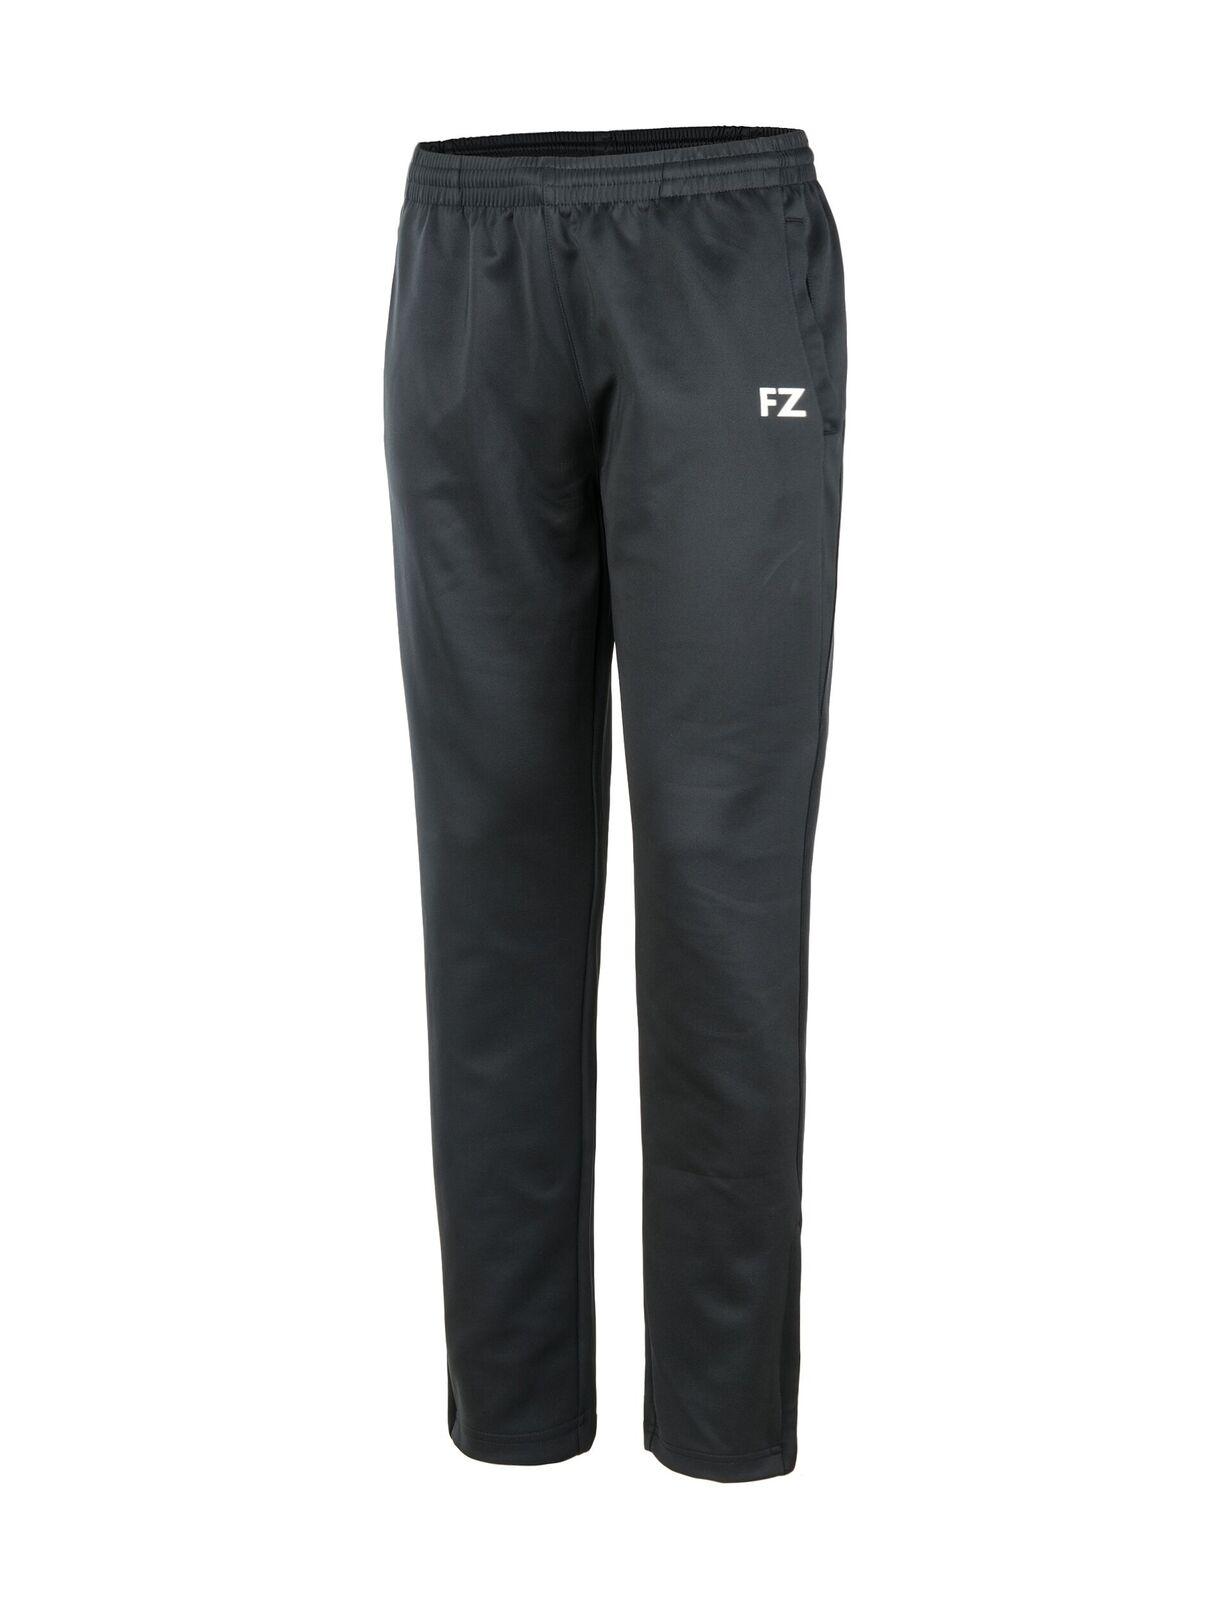 Forza Pantaloni Perry Badminton PingPong Completo